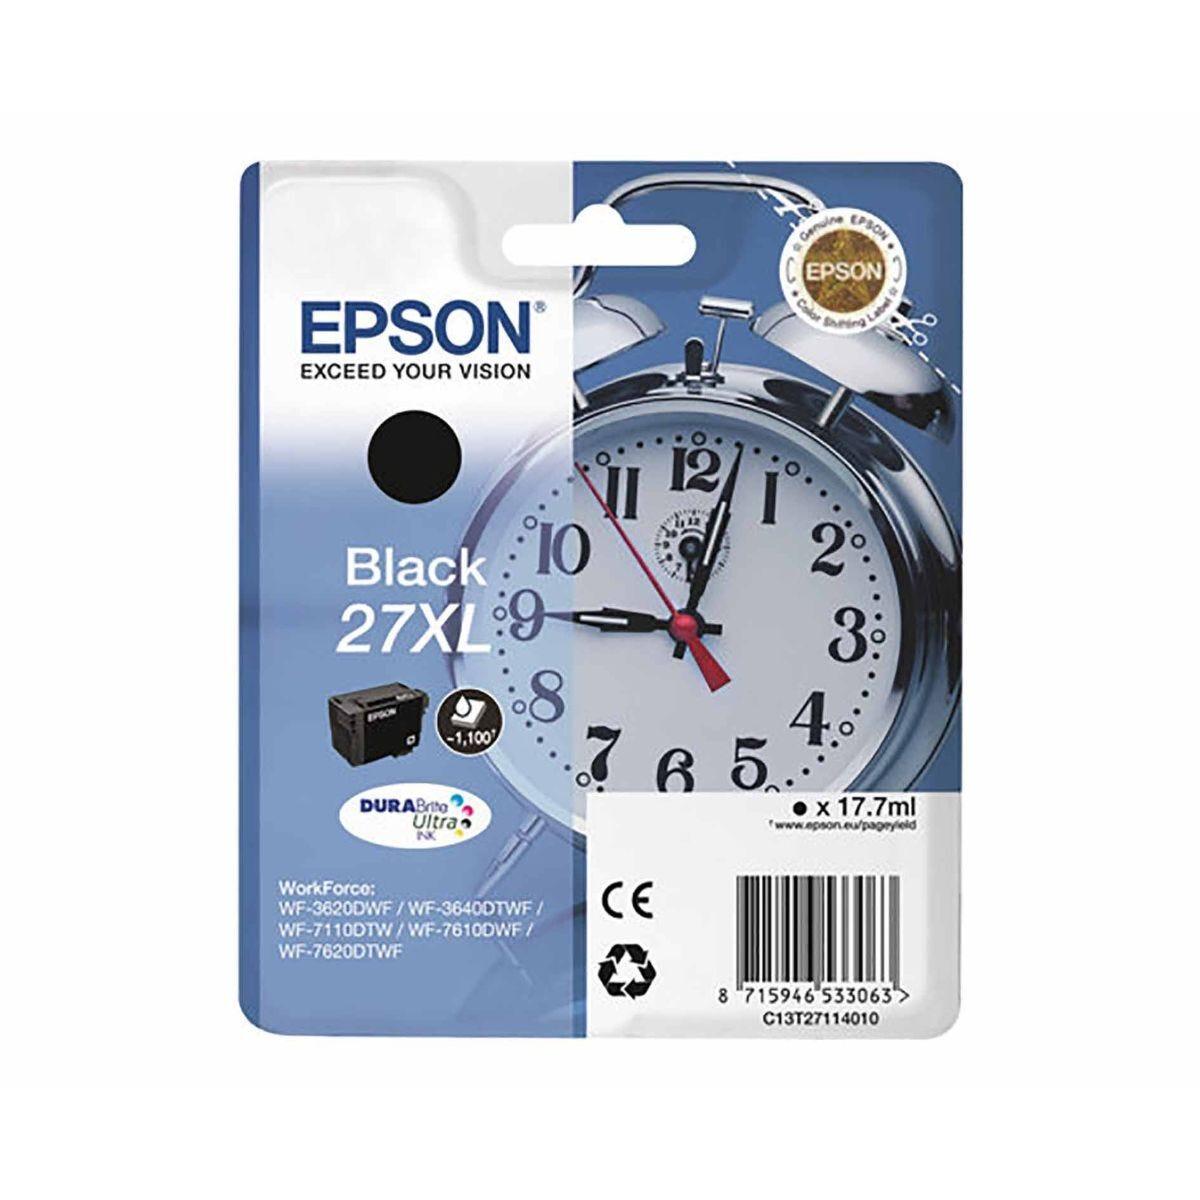 Epson 27XL Alarm Clock Original Ink Cartridge Black